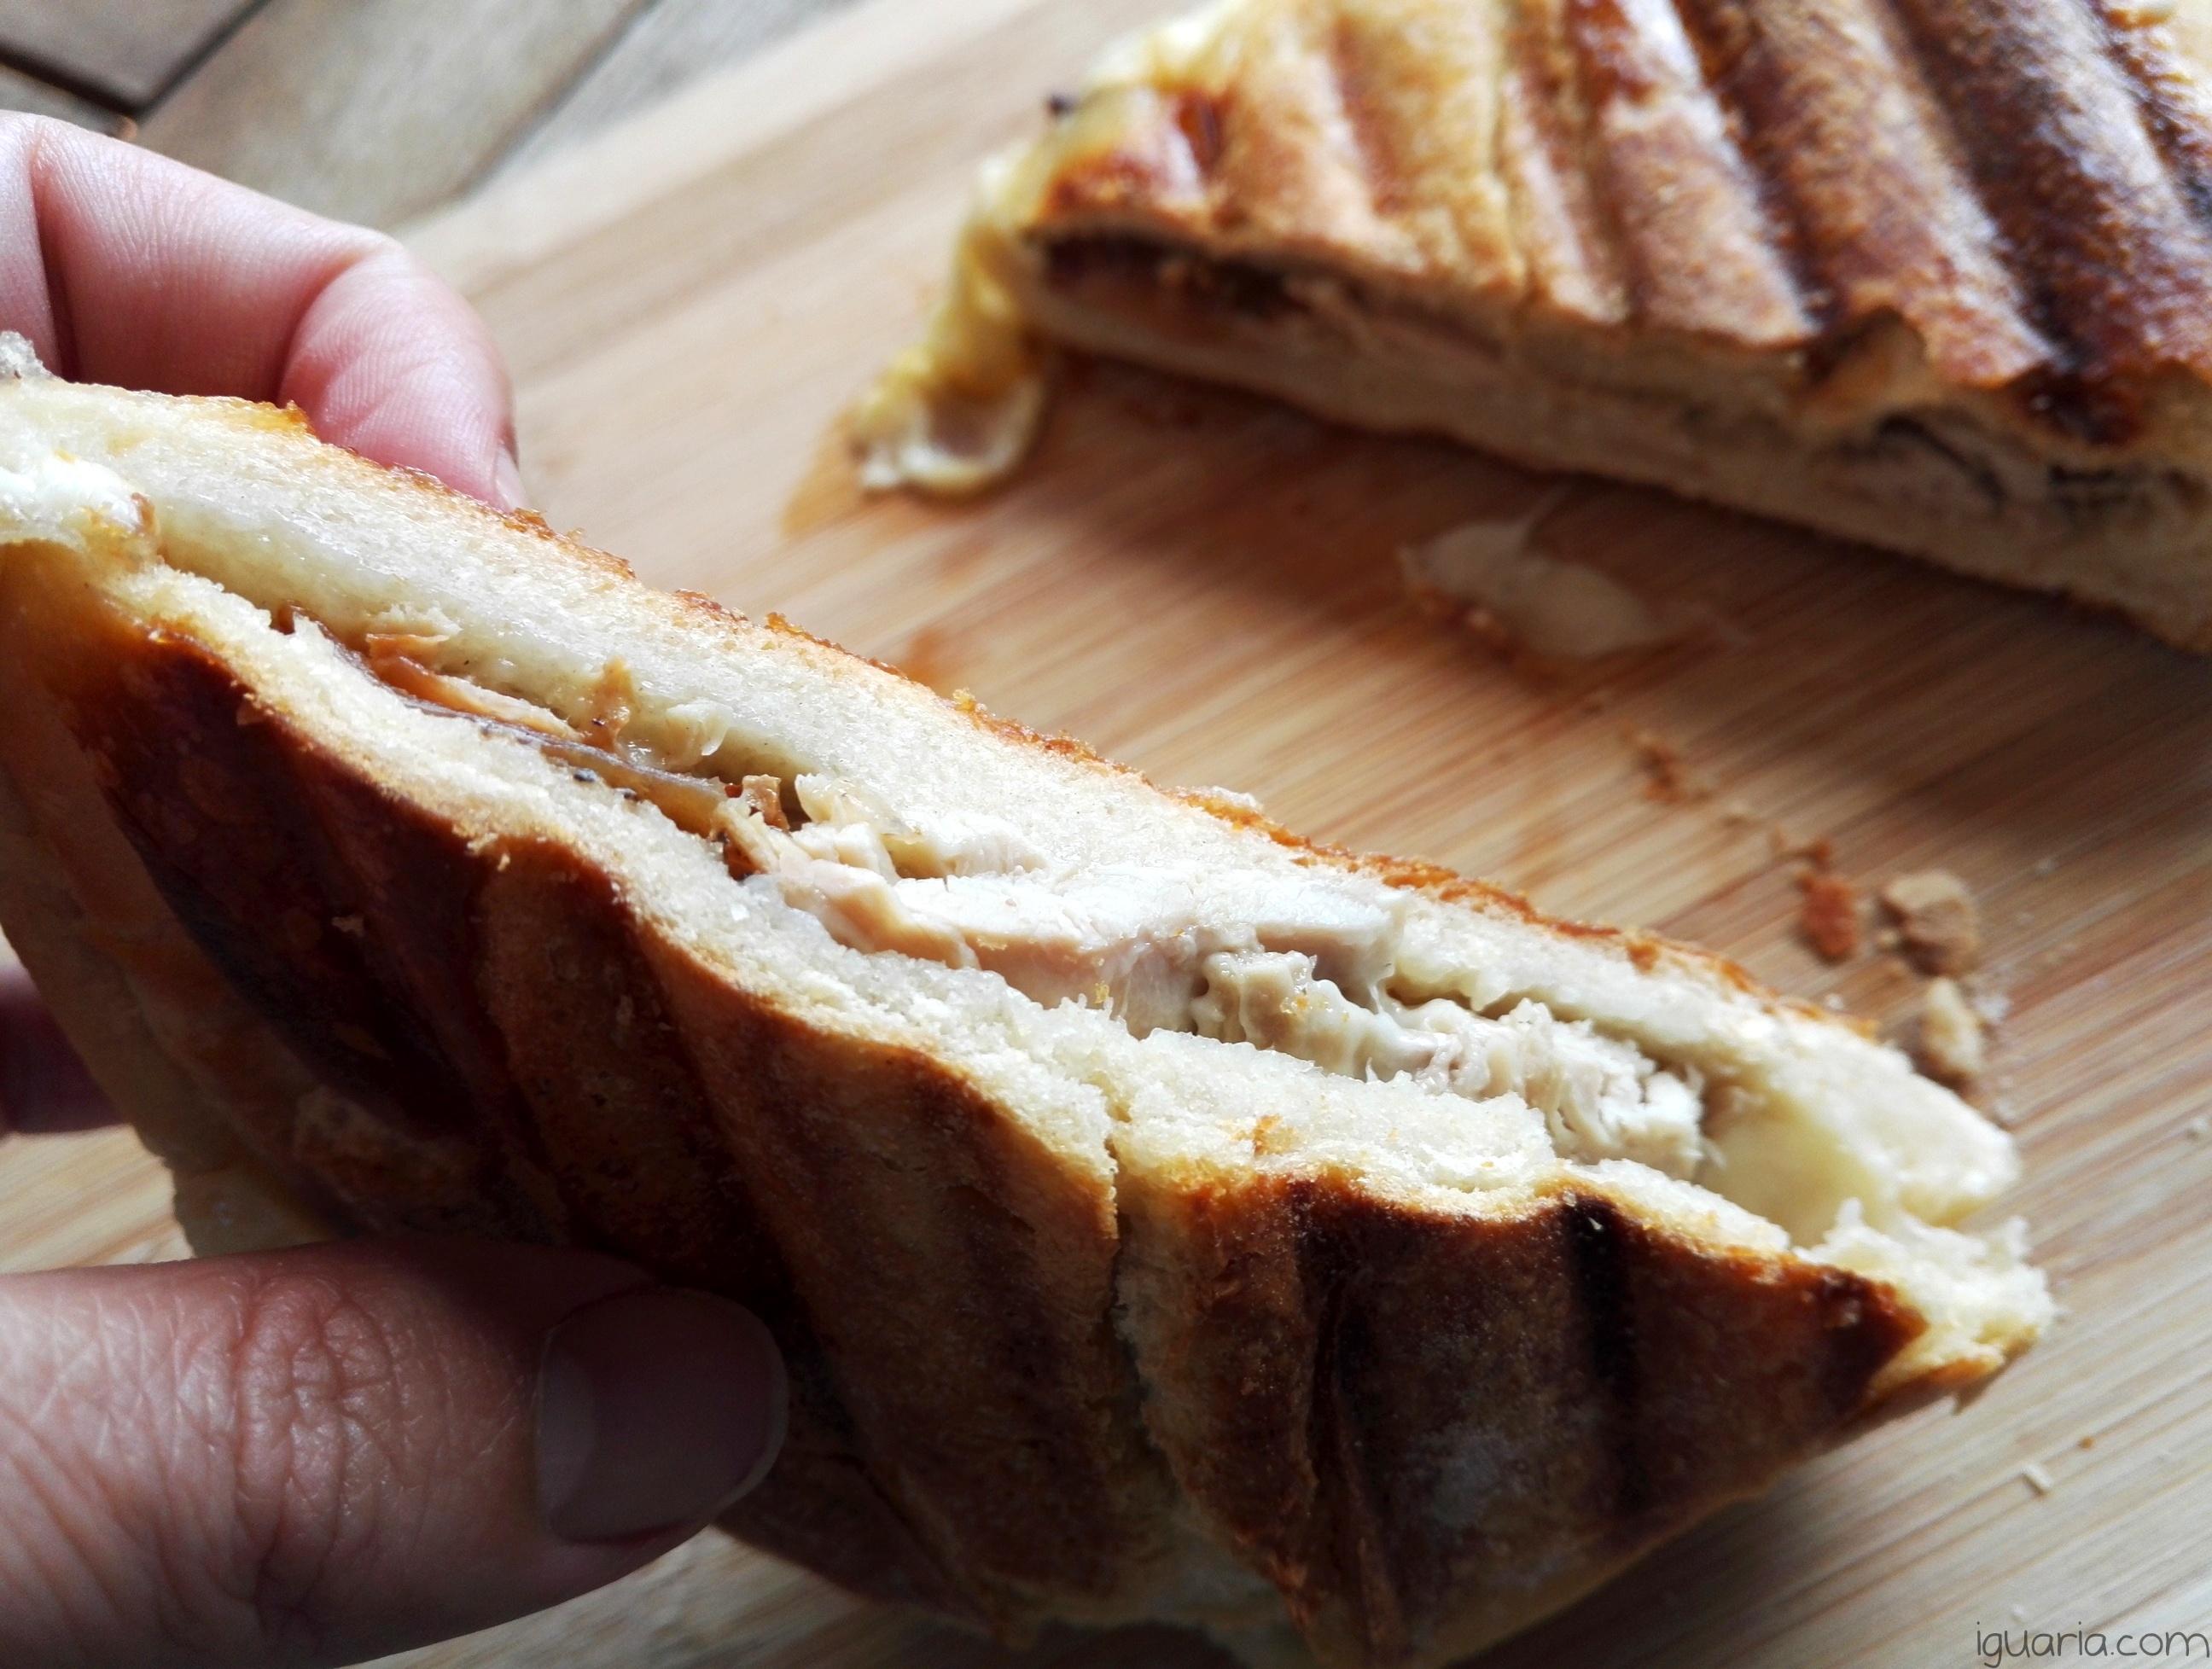 iguaria-tosta-de-queijo-derretido-e-leitao